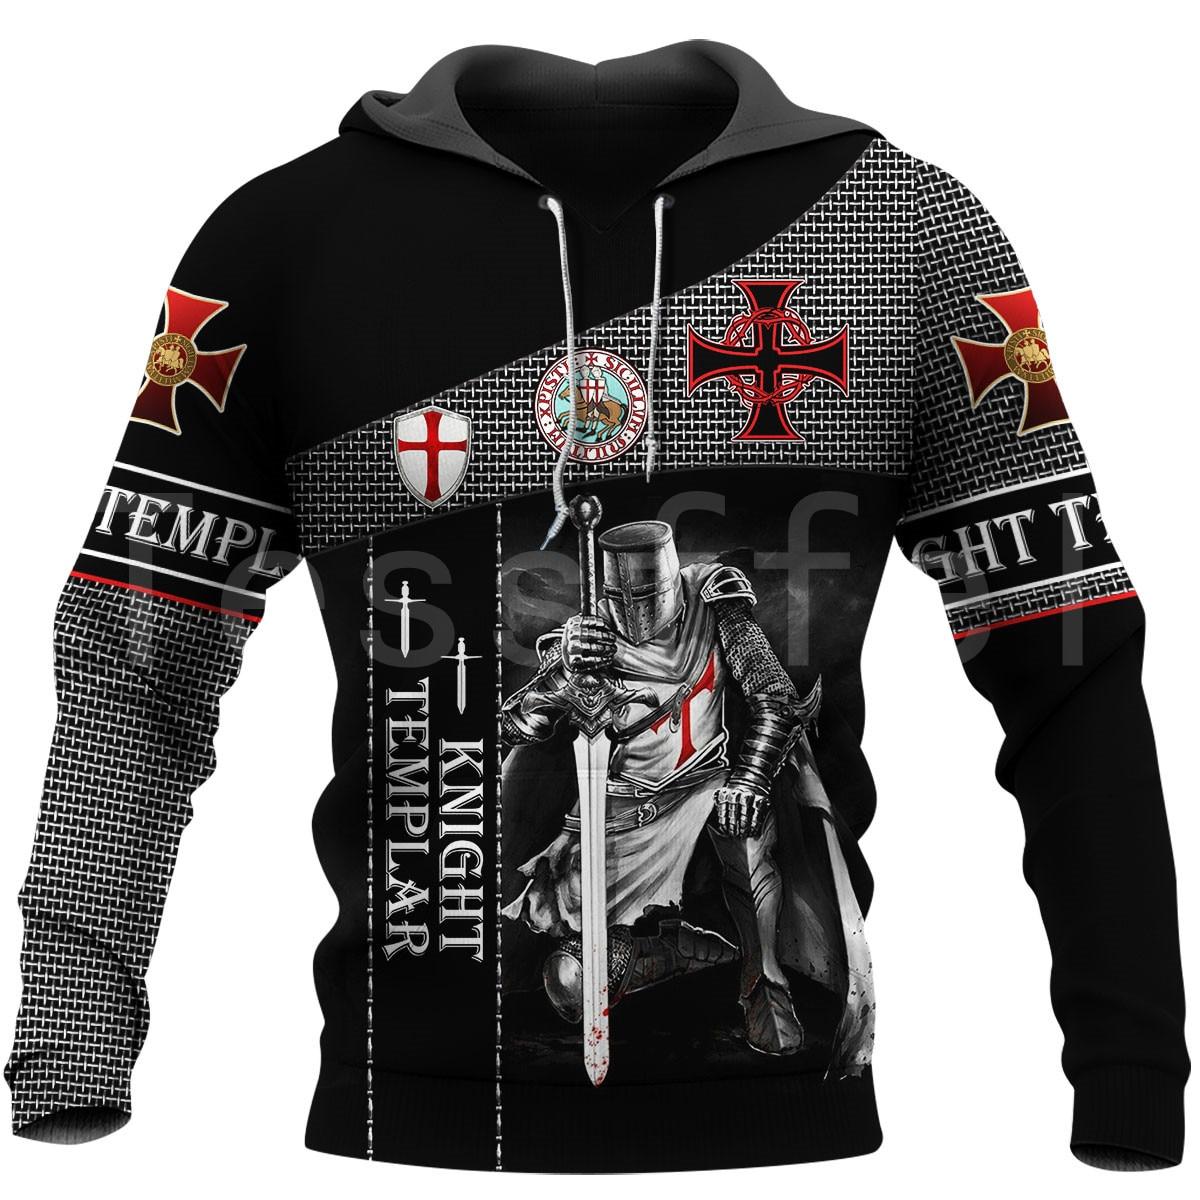 Tessffel Newest Knight Templar Armor Jesus God Guard Cavalier Pullover Streetwear NewFashion 3DPrint Men/Women Funny Hoodies D-9